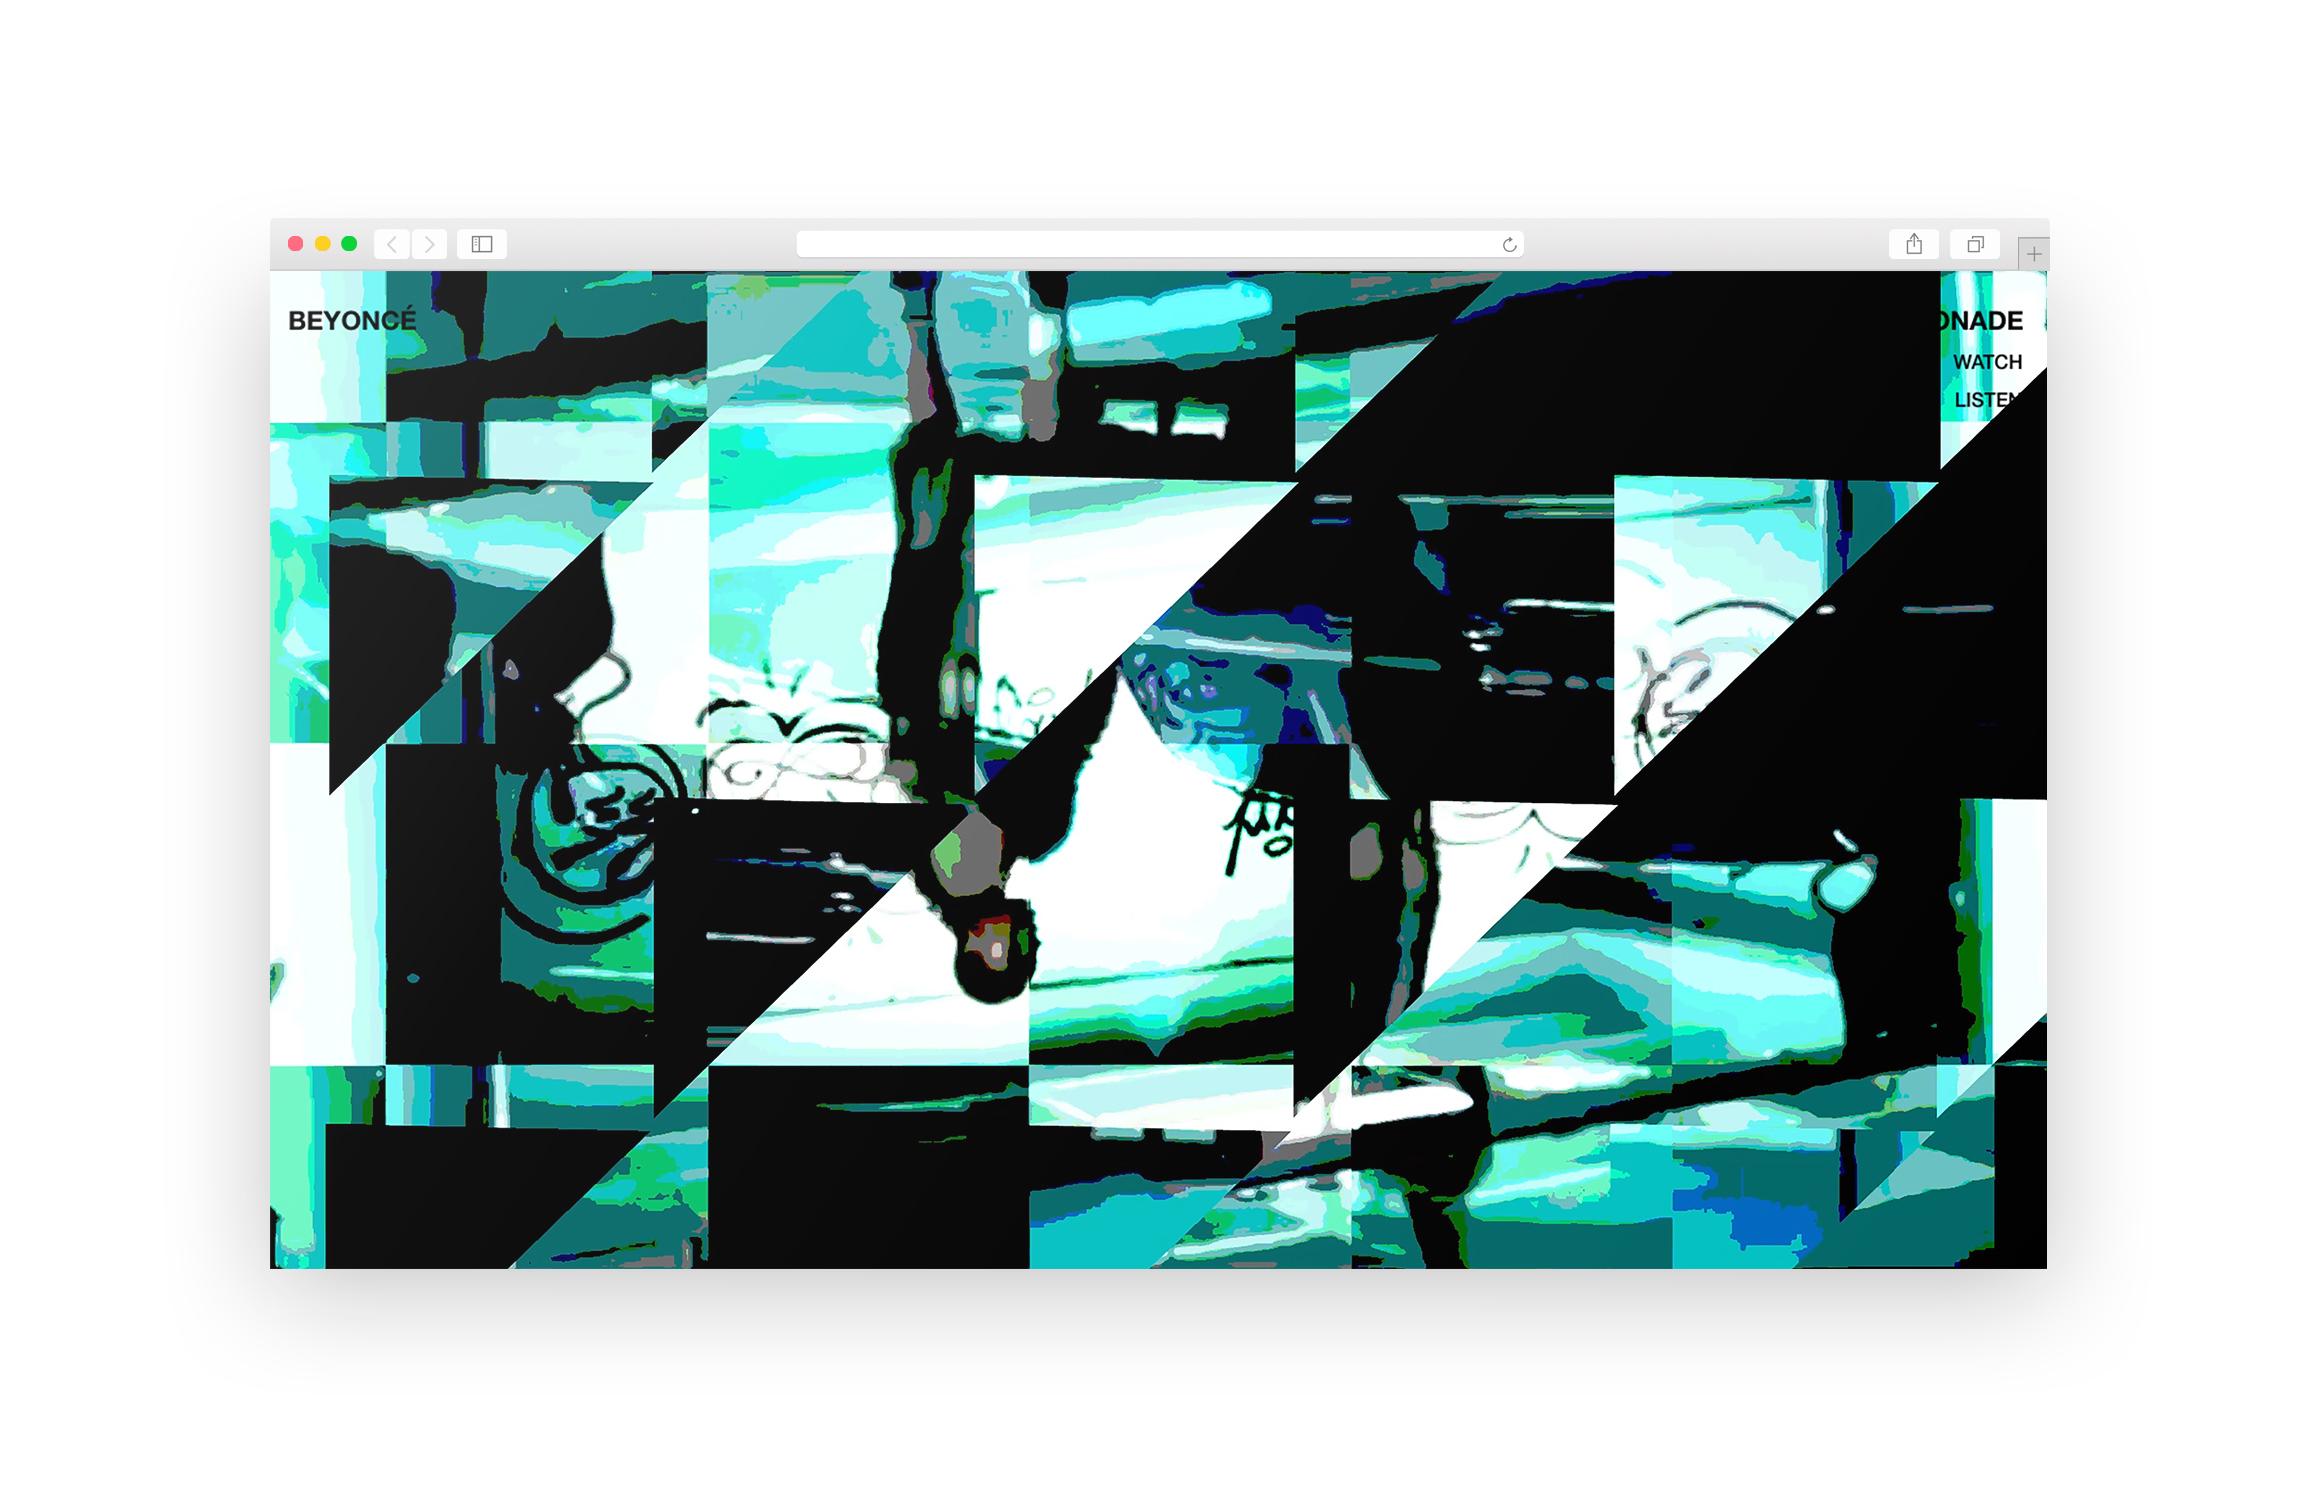 distortion_22.jpg